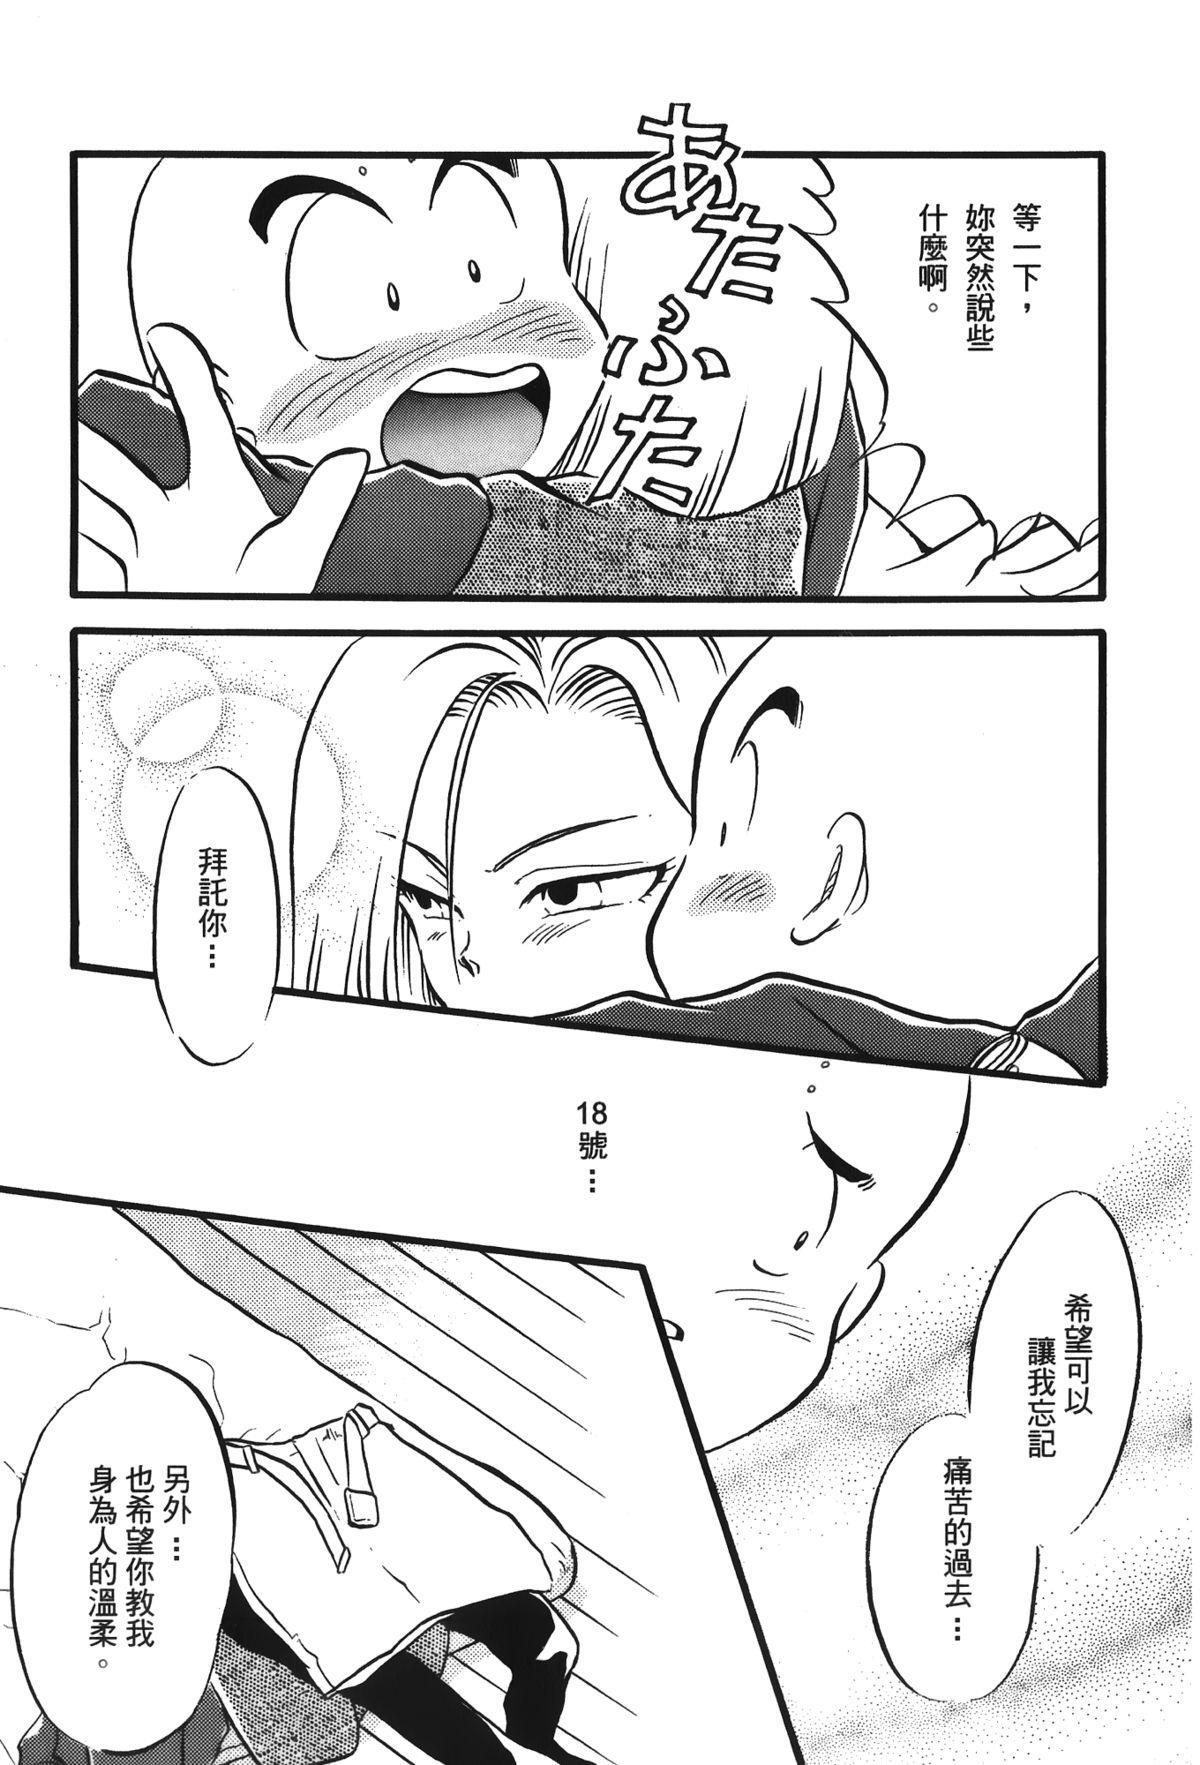 Dragon Pearl 05 81